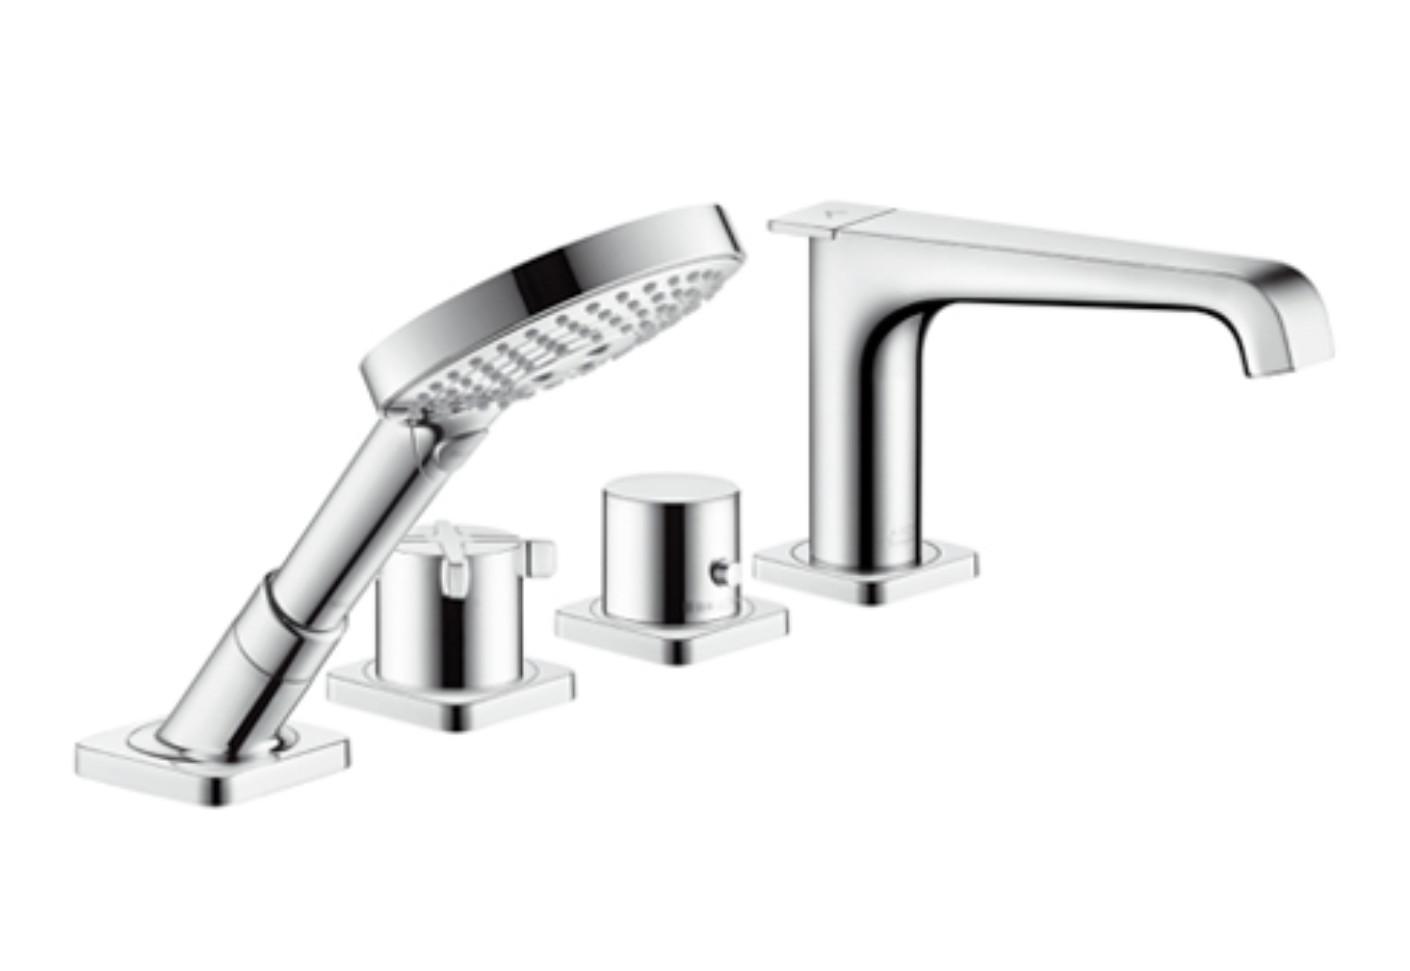 axor citterio e 4 hole rim tile mounted bath mixer by axor stylepark. Black Bedroom Furniture Sets. Home Design Ideas